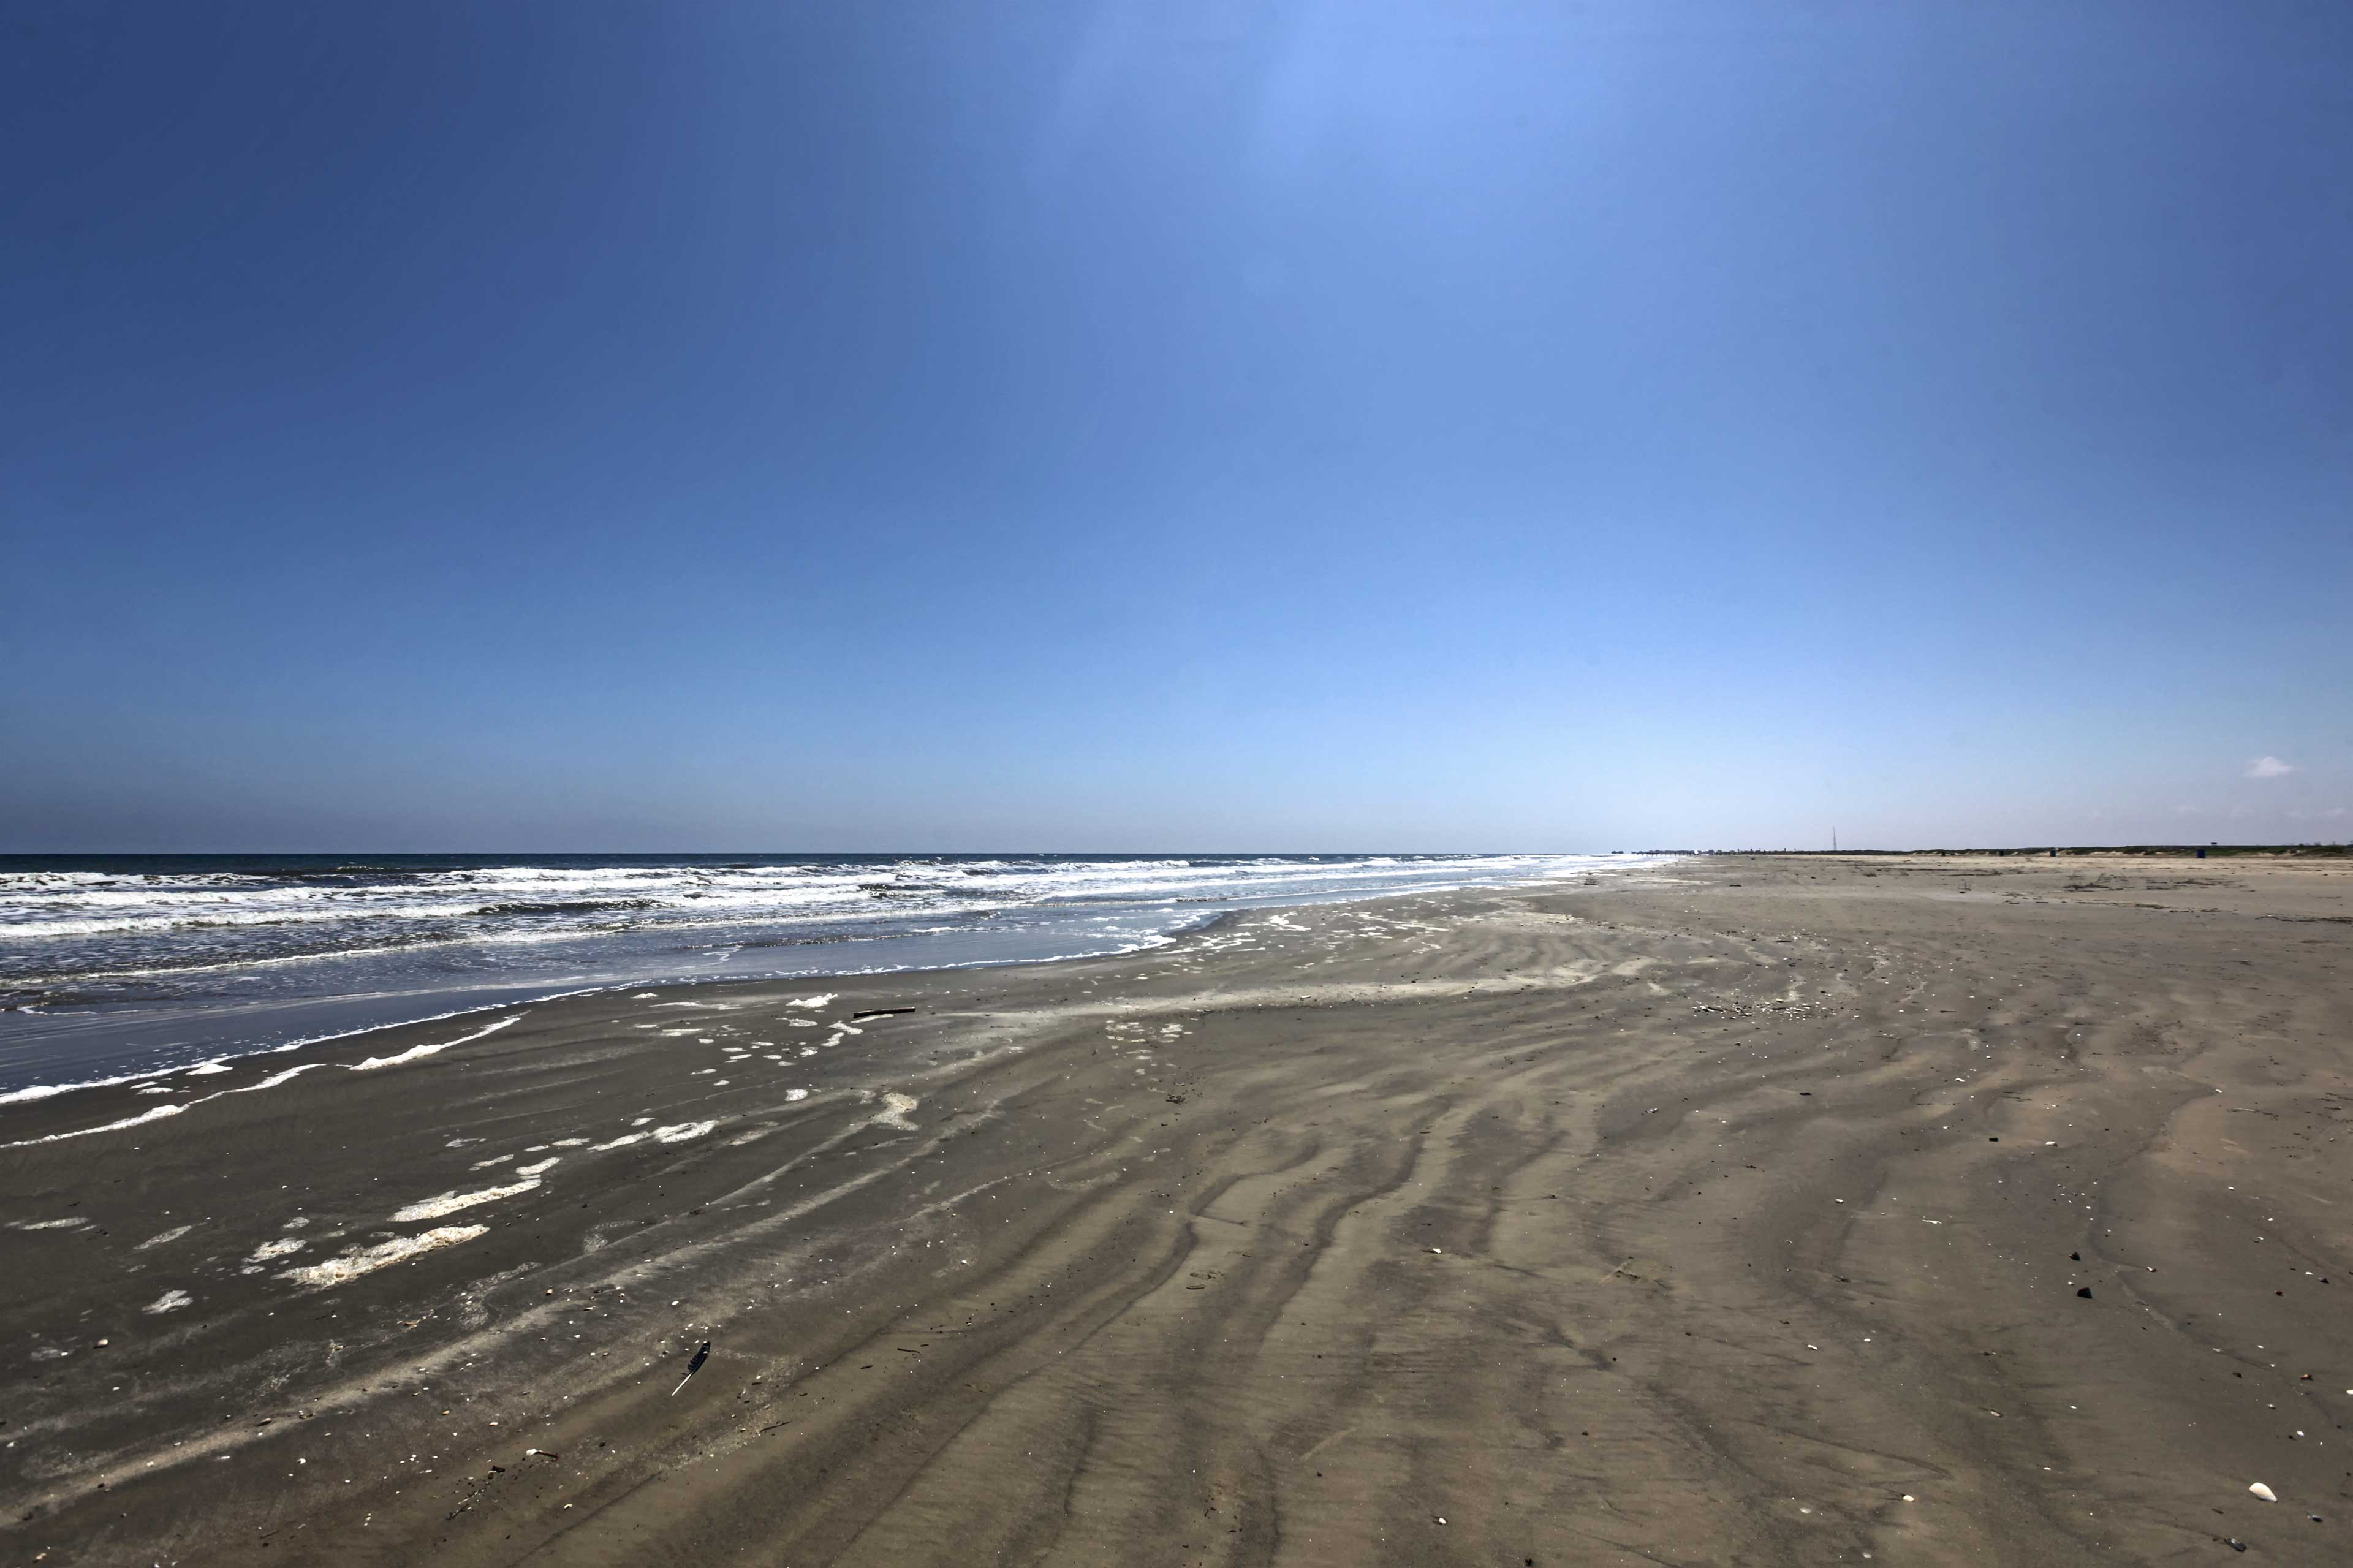 The sandy shores of Galveston are a stone's throw away!